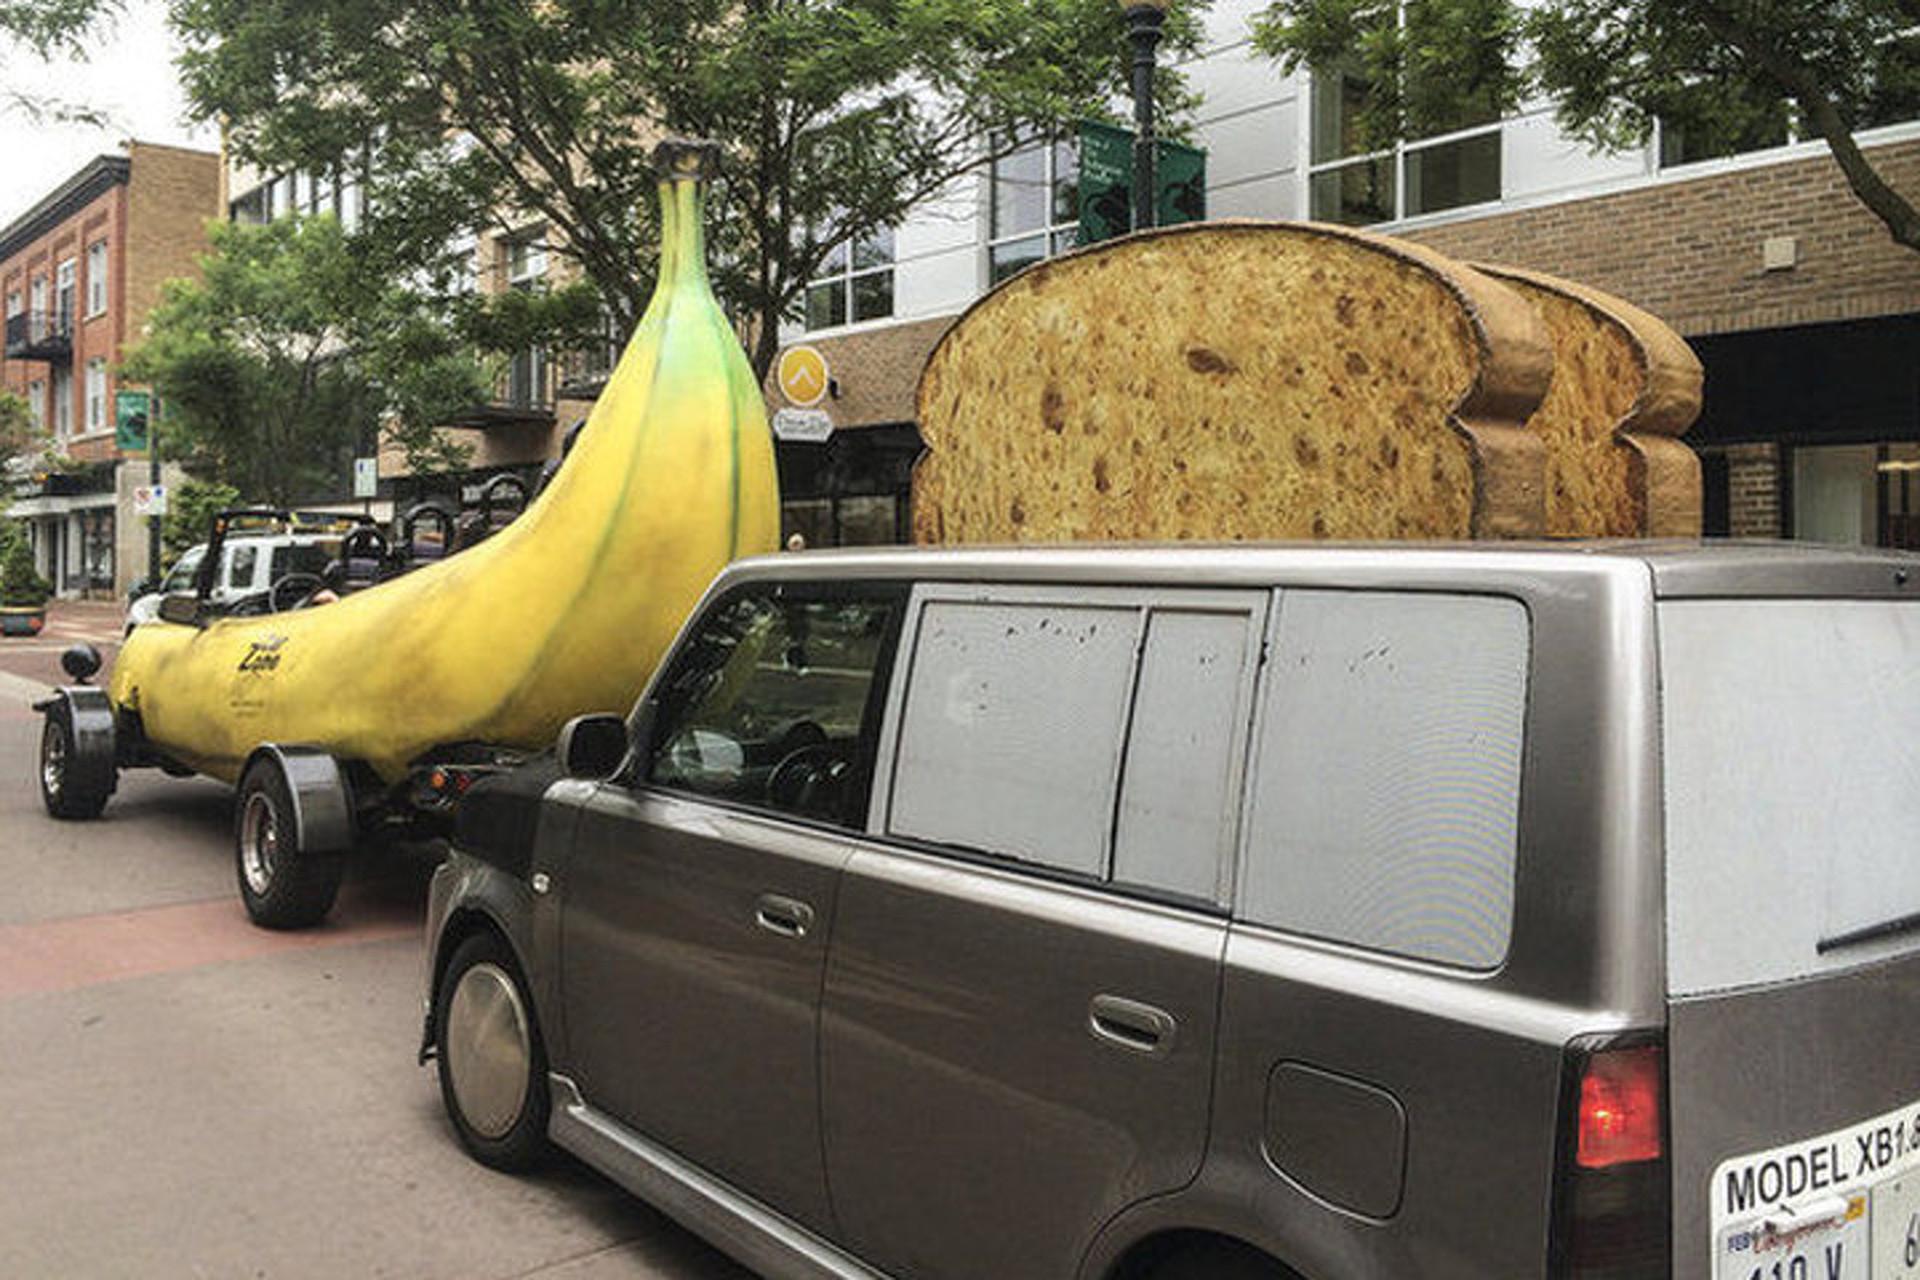 Giant Banana Car Meets Giant Toaster Car in Kalamazoo, MI